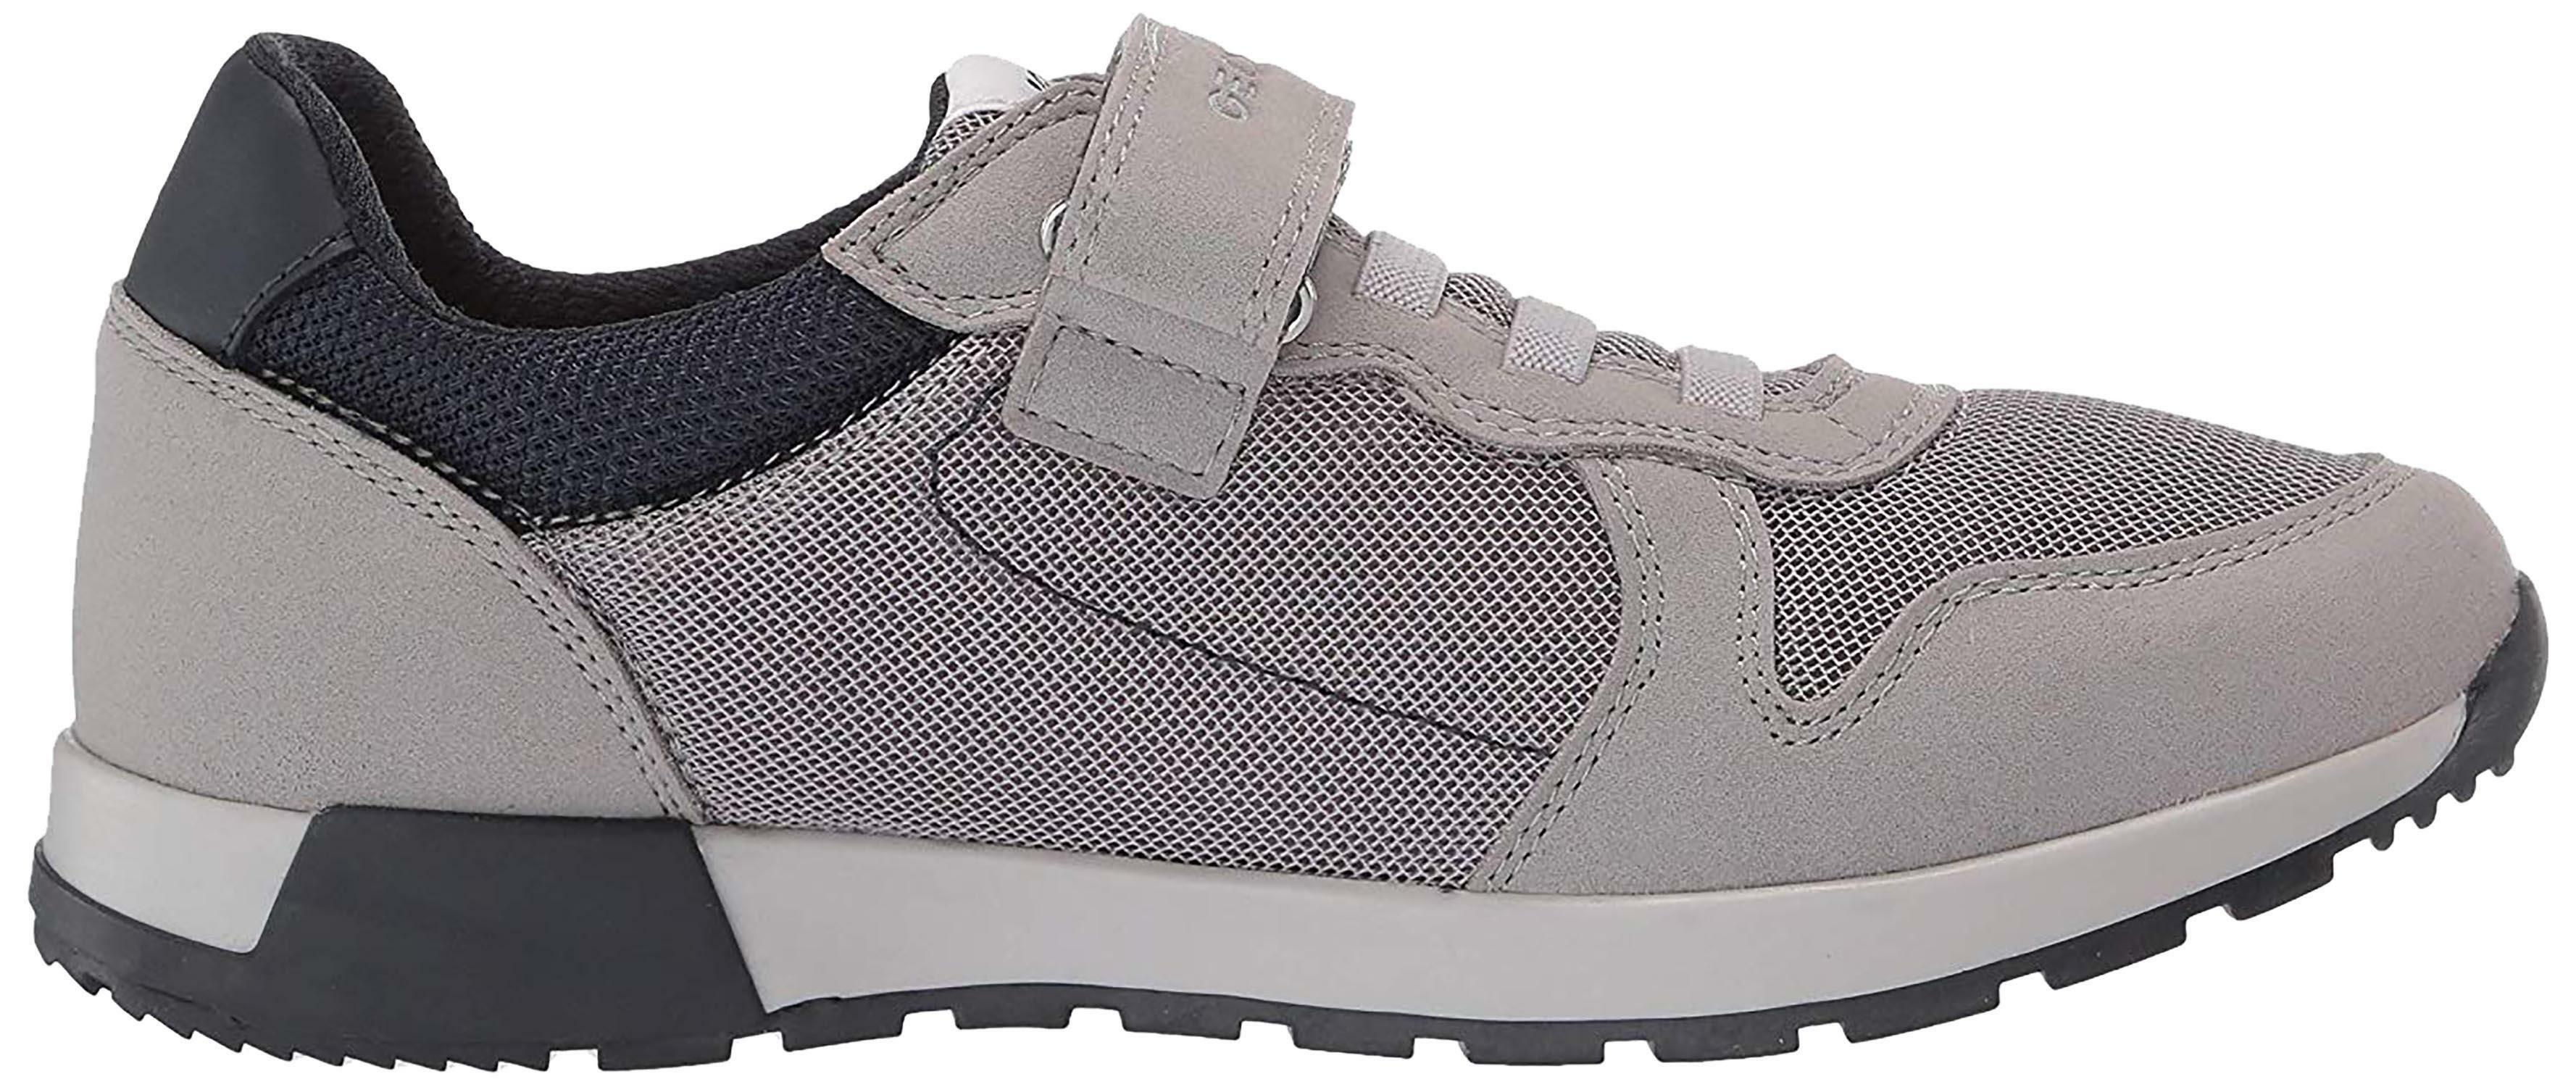 Geox j alfier b scarpe sportive bambino grigie j846ncc0665